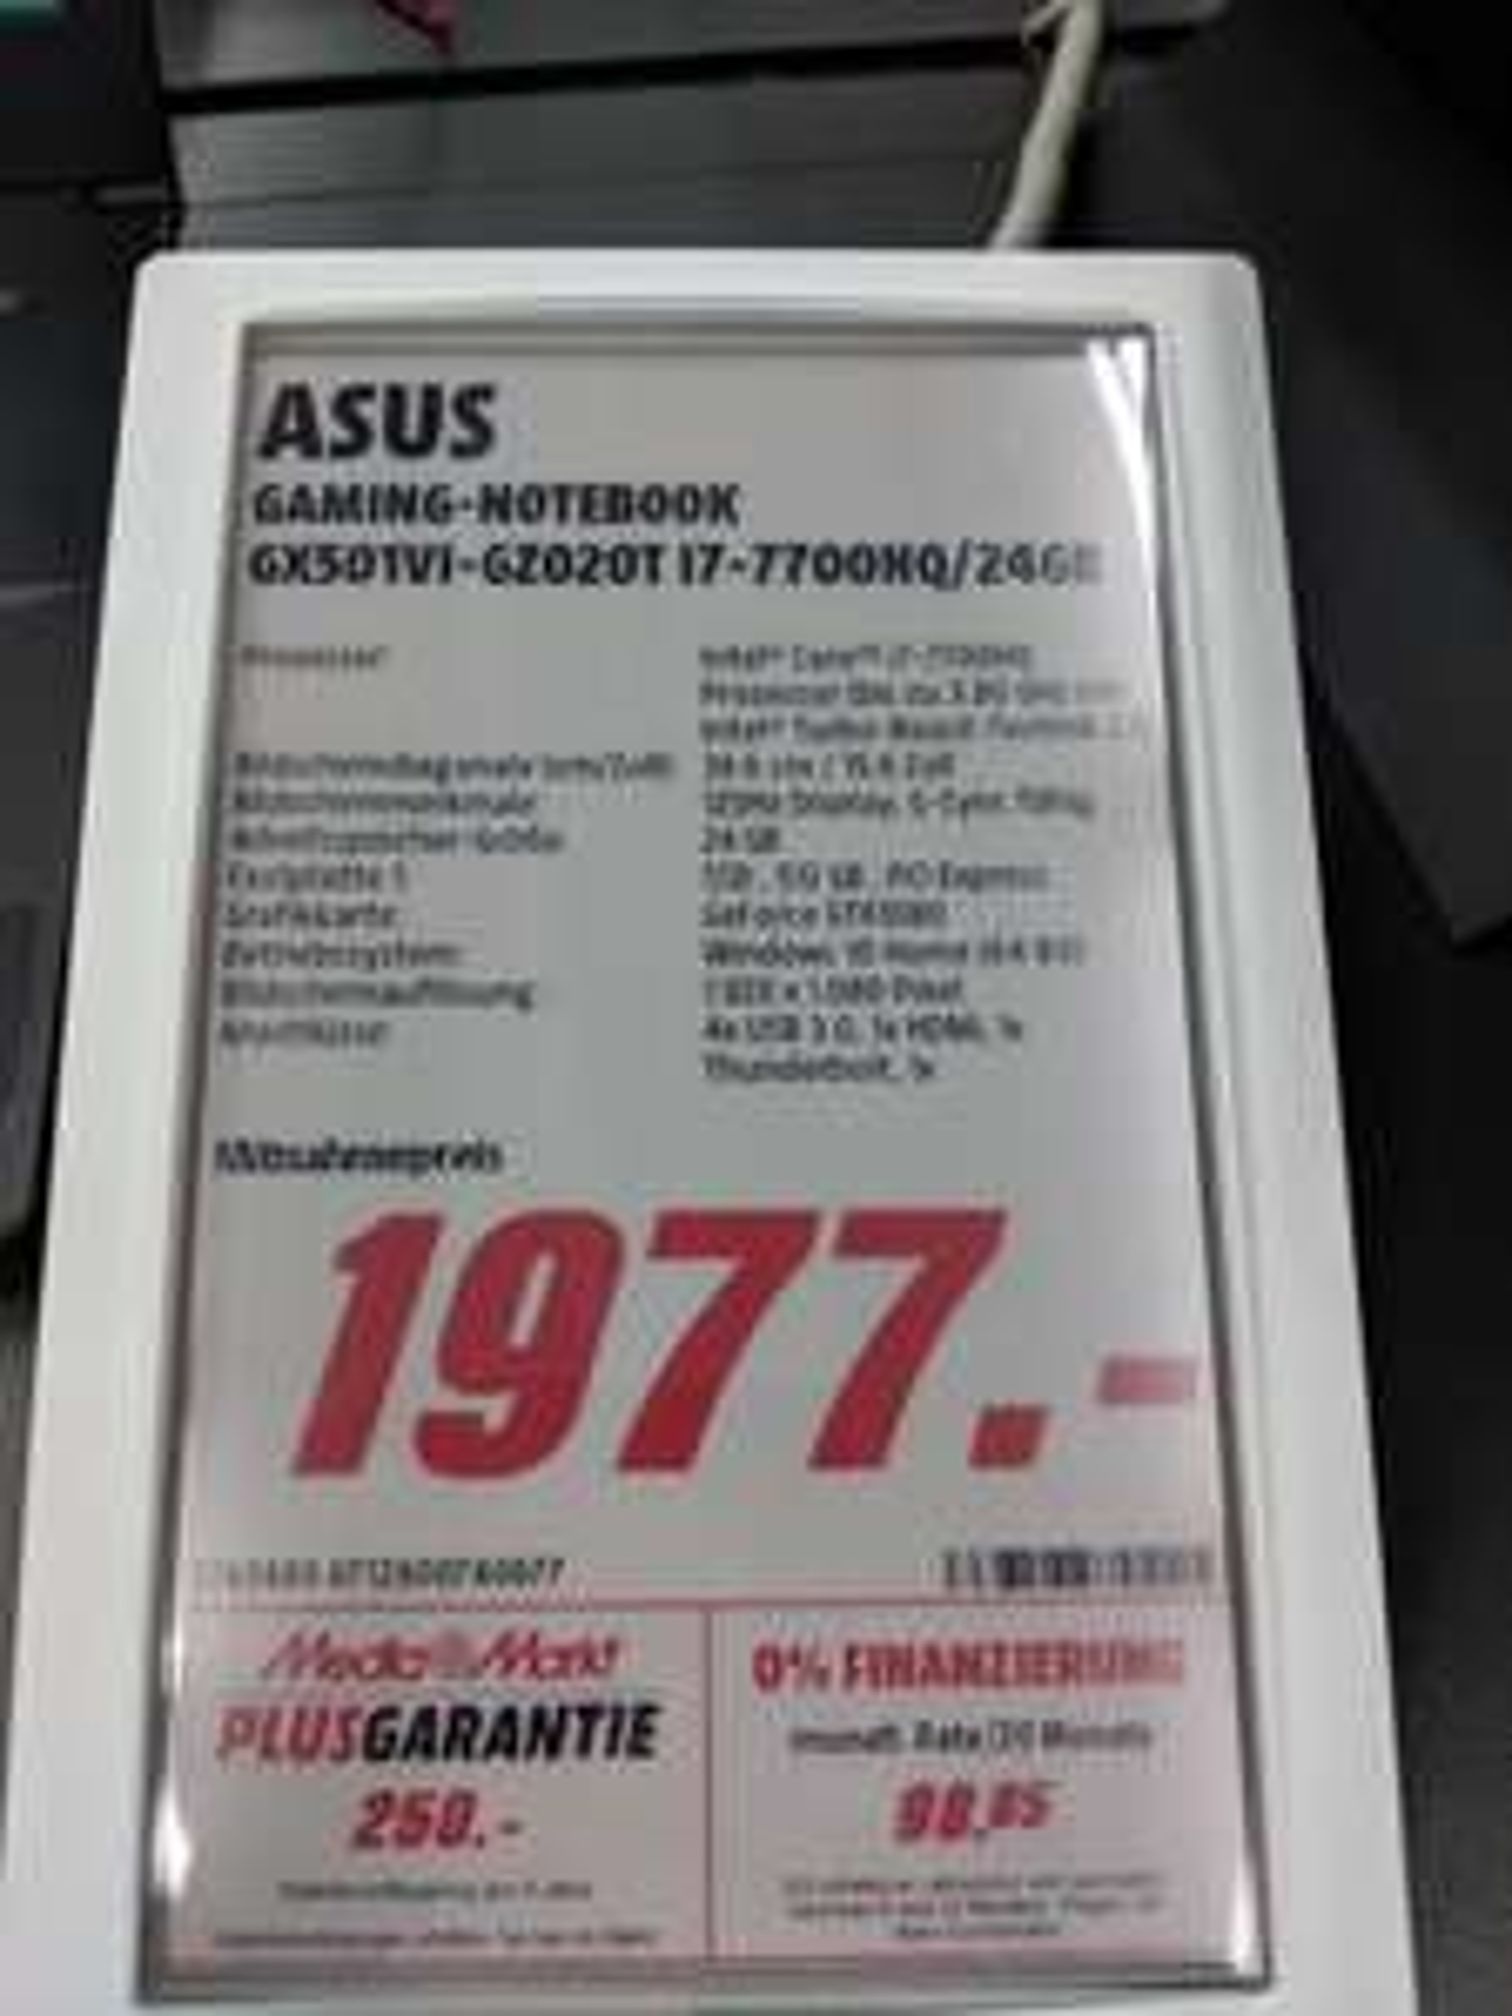 Asus ROG Zephyrus GX501VI-GZ020T Notebook